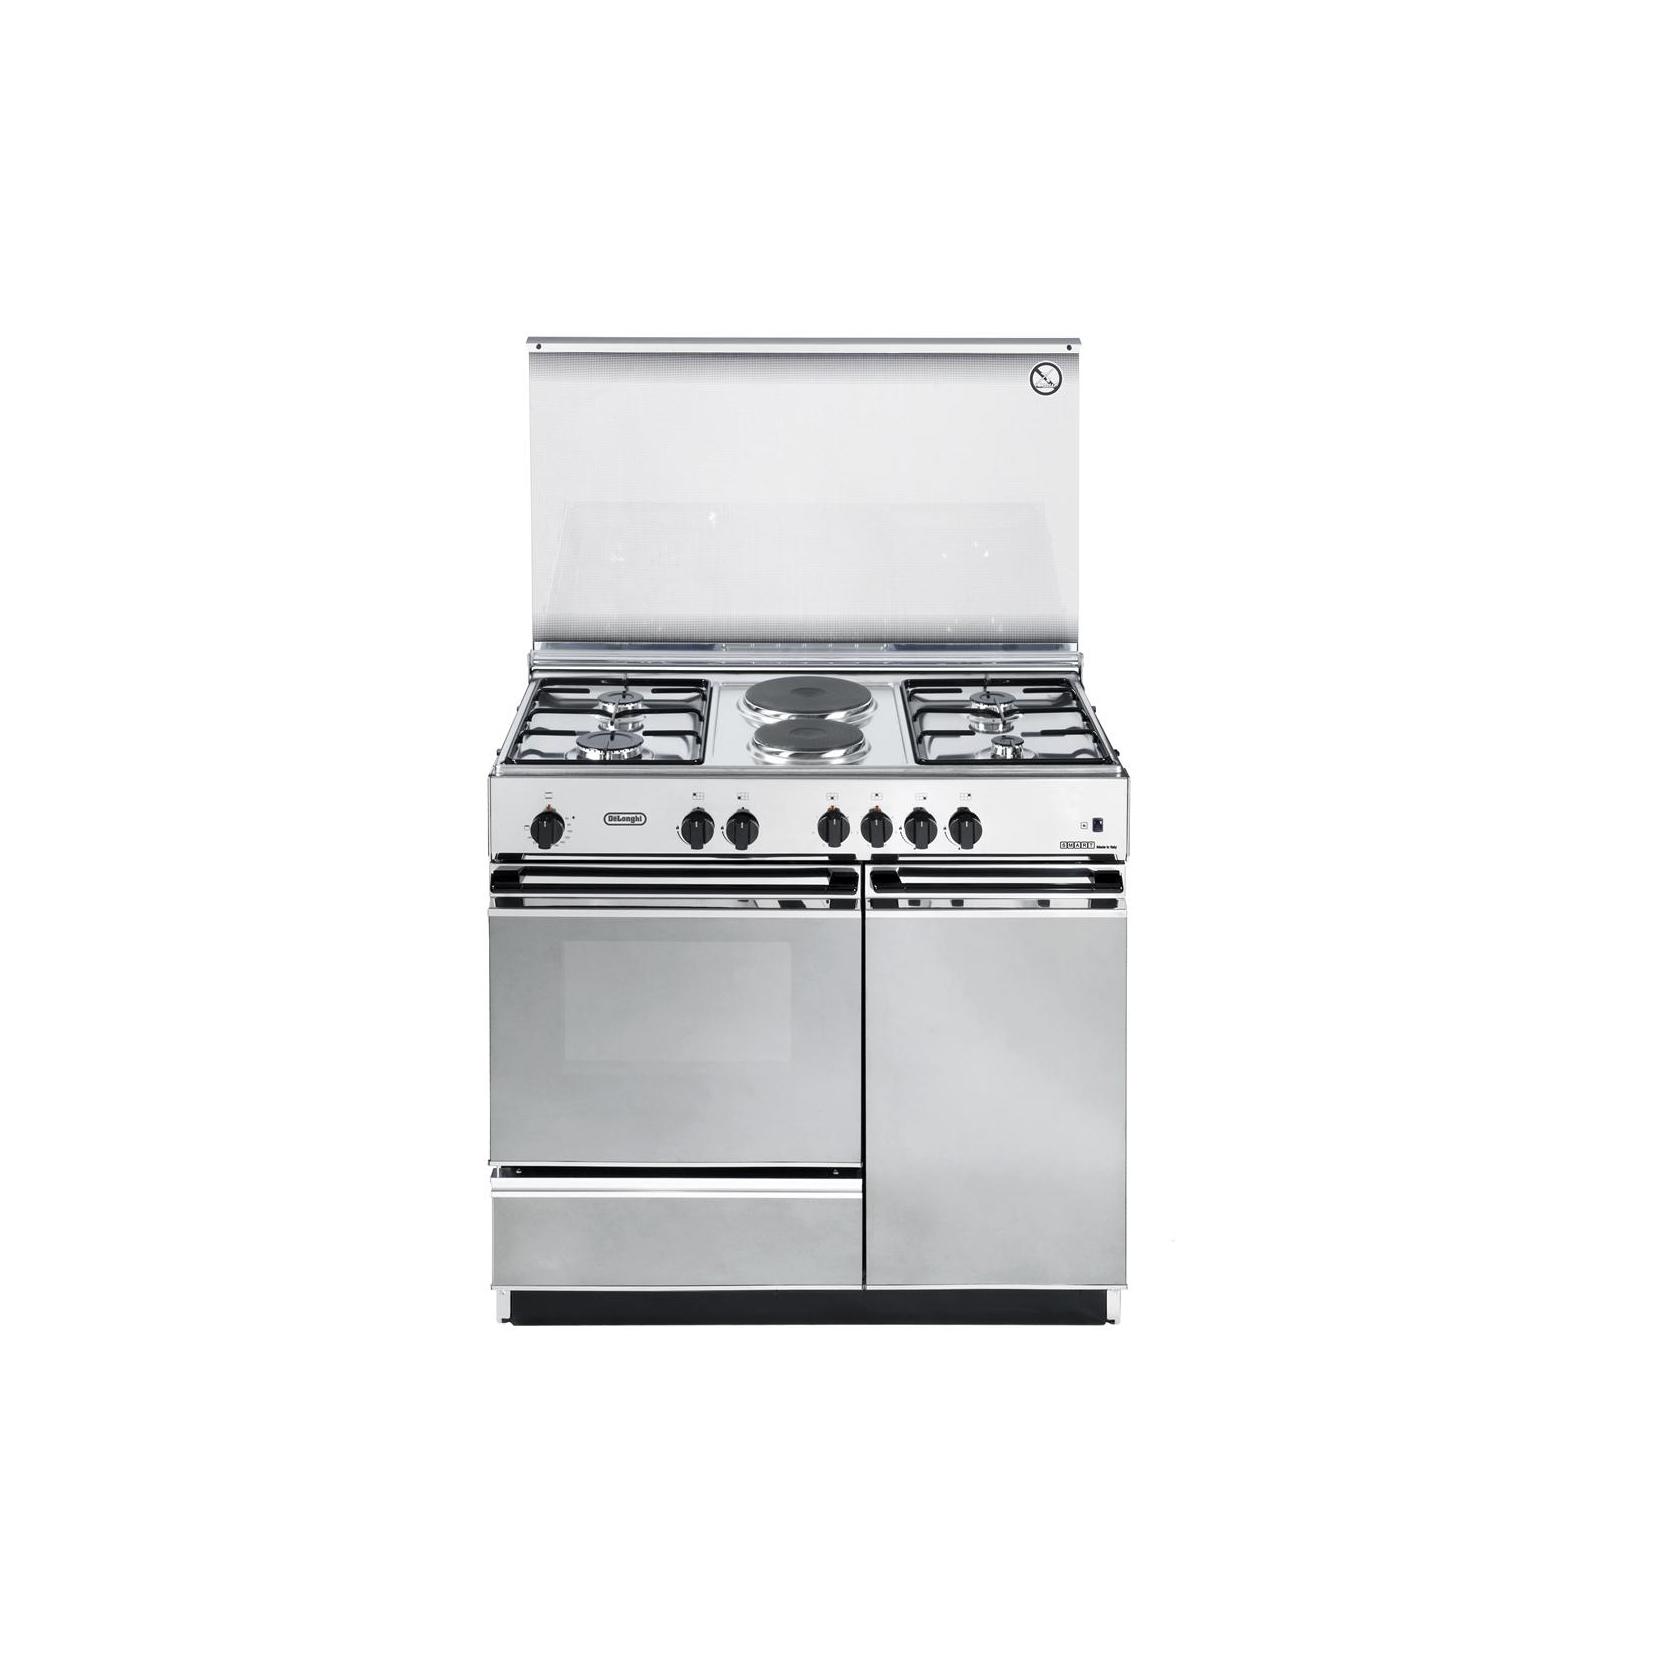 Cucina de longhi sex8542n inox 86 50 forno elettrico 4 fuochi 2 piastre elettriche garanzia - Cucina elettrica de longhi ...